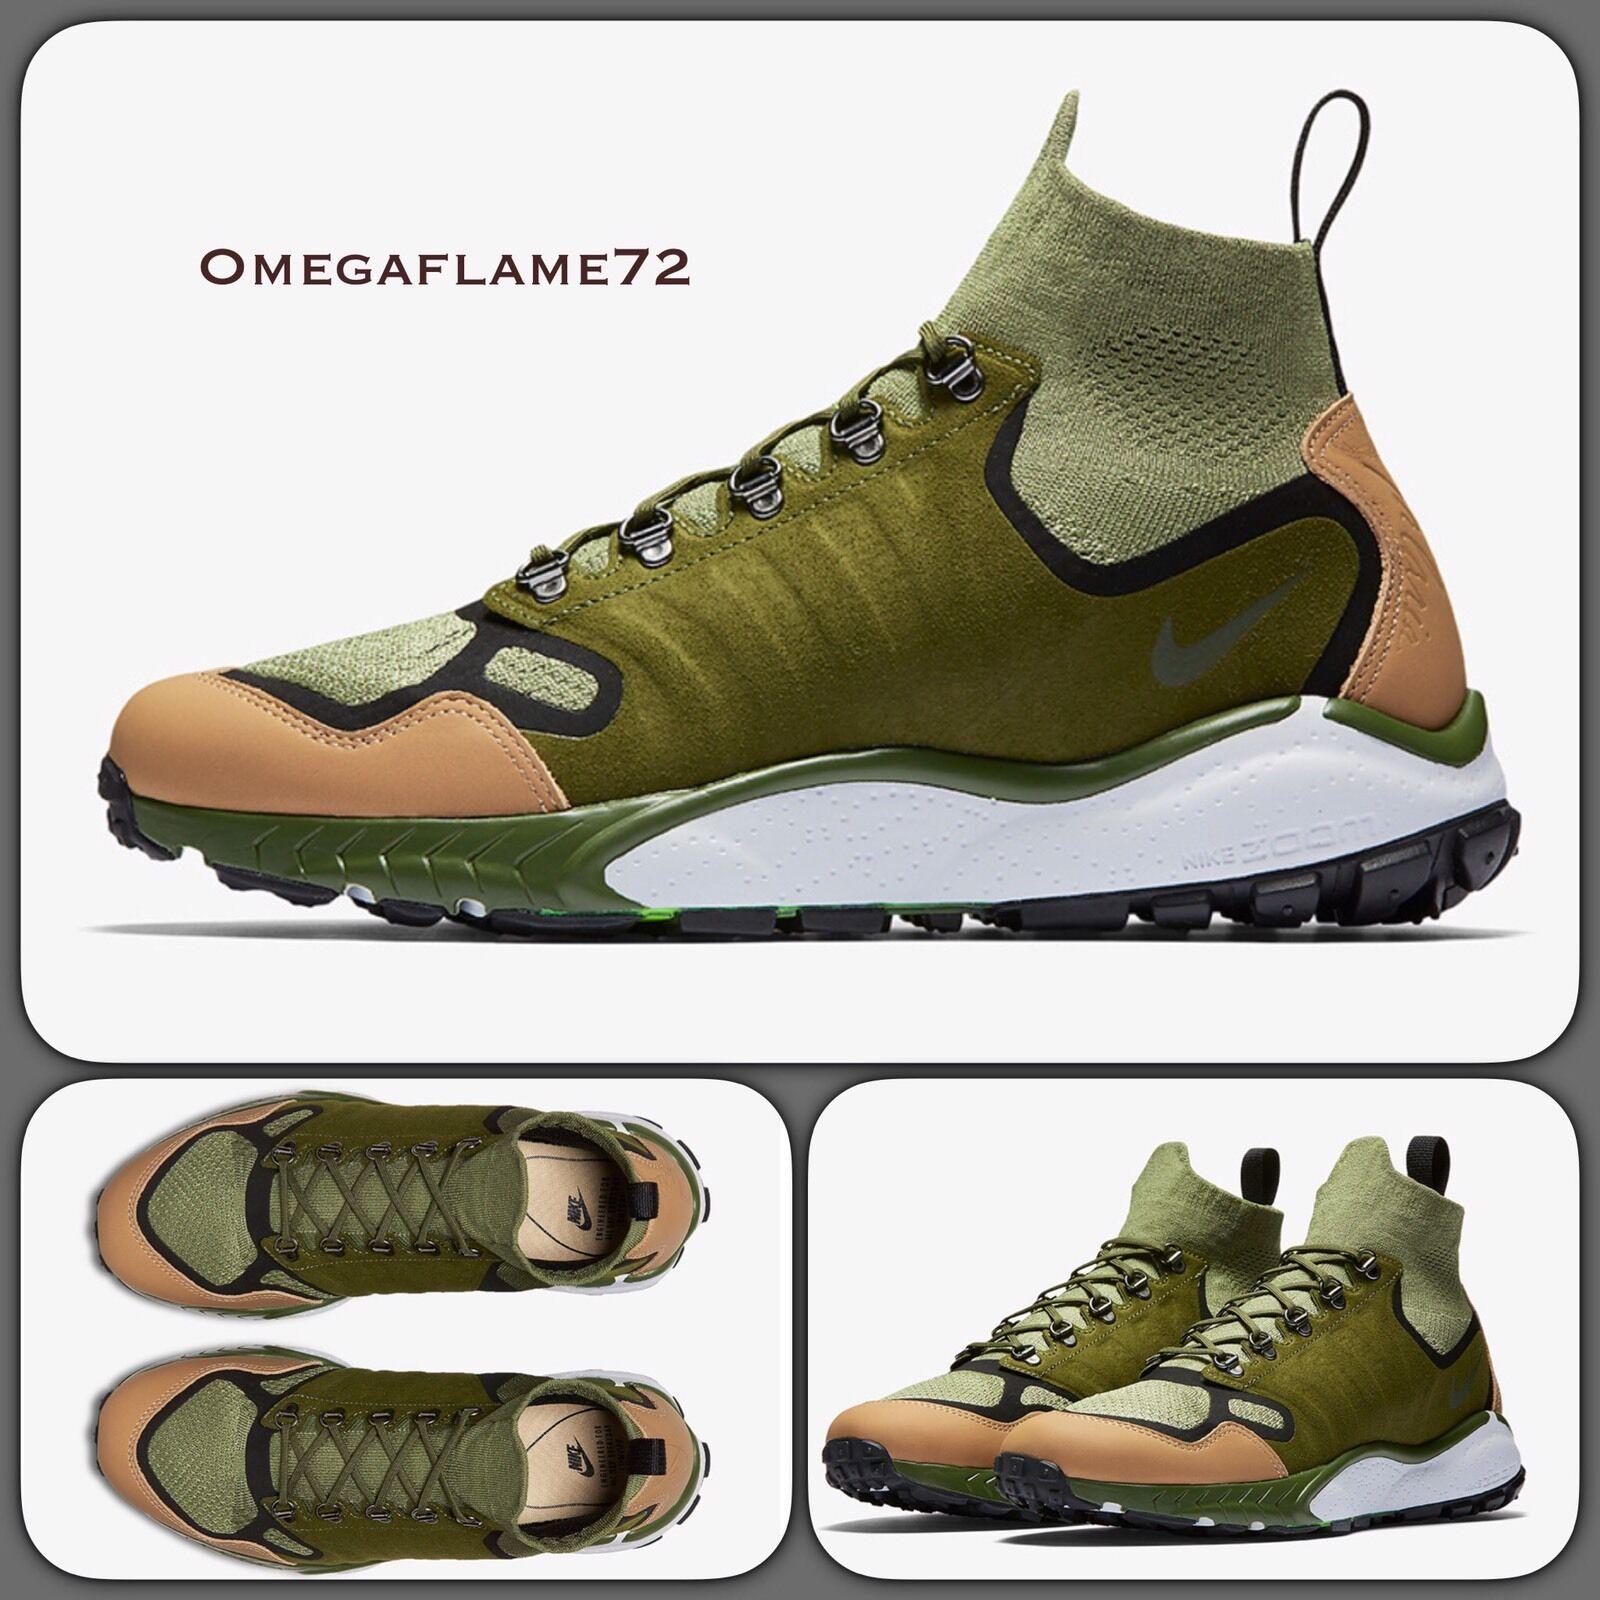 Nike Zoom Talaria Mid Flyknit Premium Air 875784-300 Reino Reino 875784-300 Unido 7, 41 de la UE, EE. UU. 8 ACG 657951